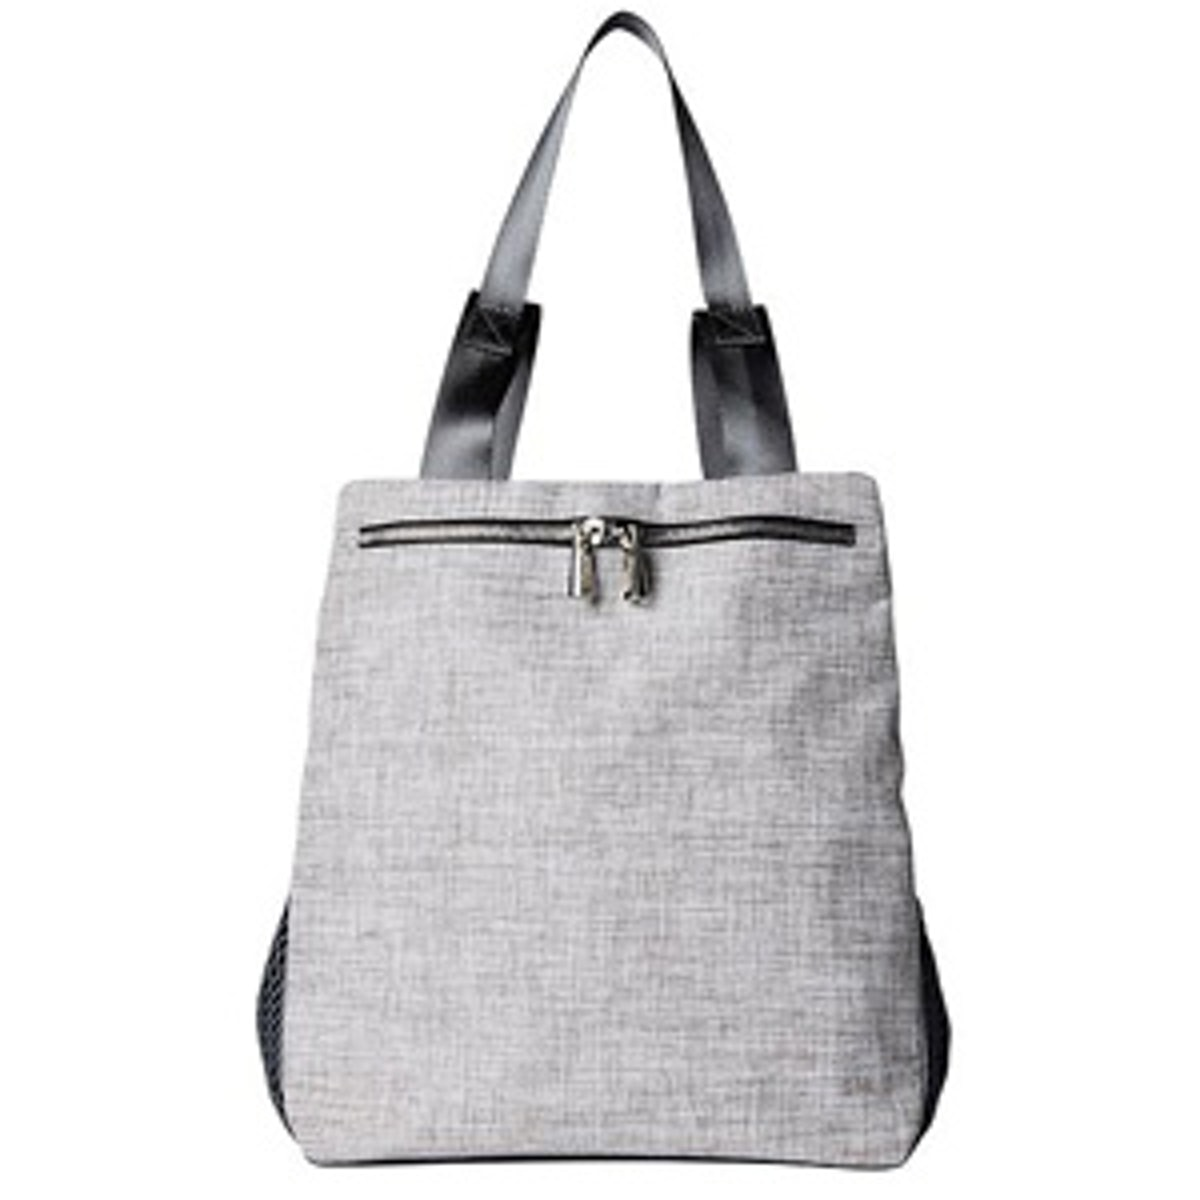 All Nýlon Bag